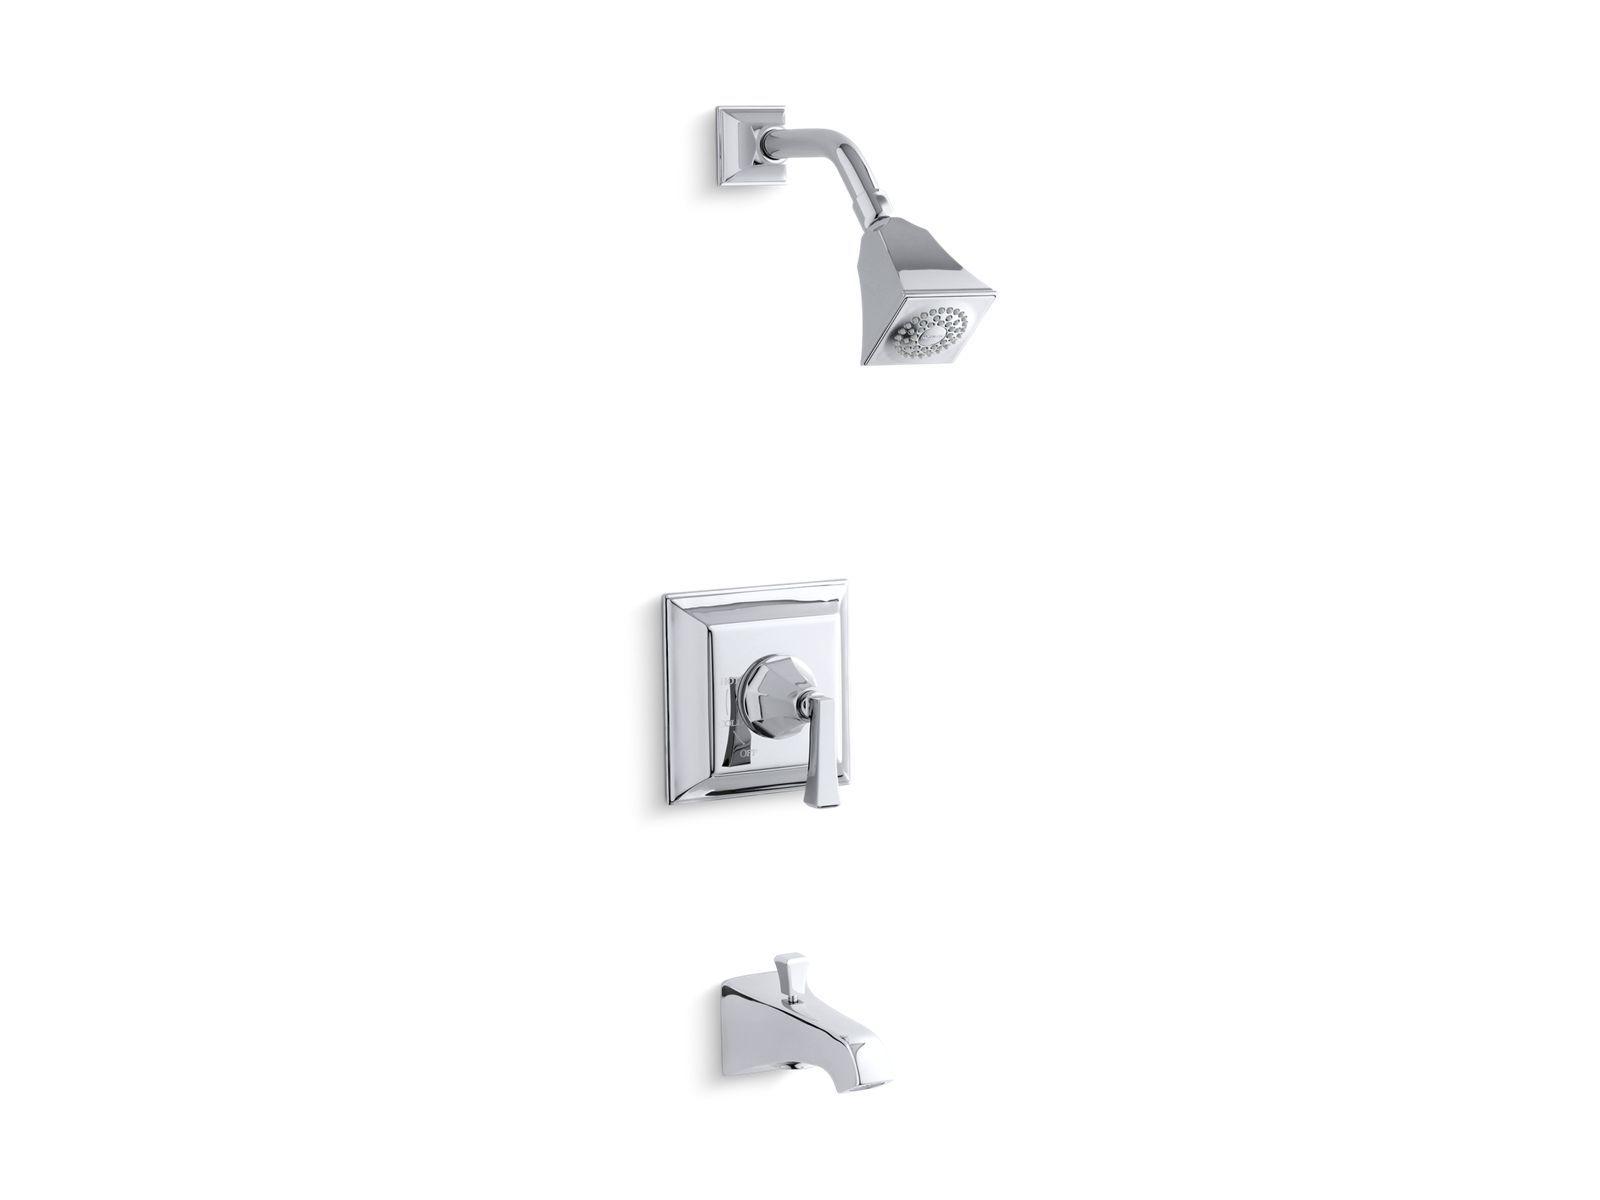 K T461 4v Memoirs Stately Rite Temp Bath And Shower Faucet Trim